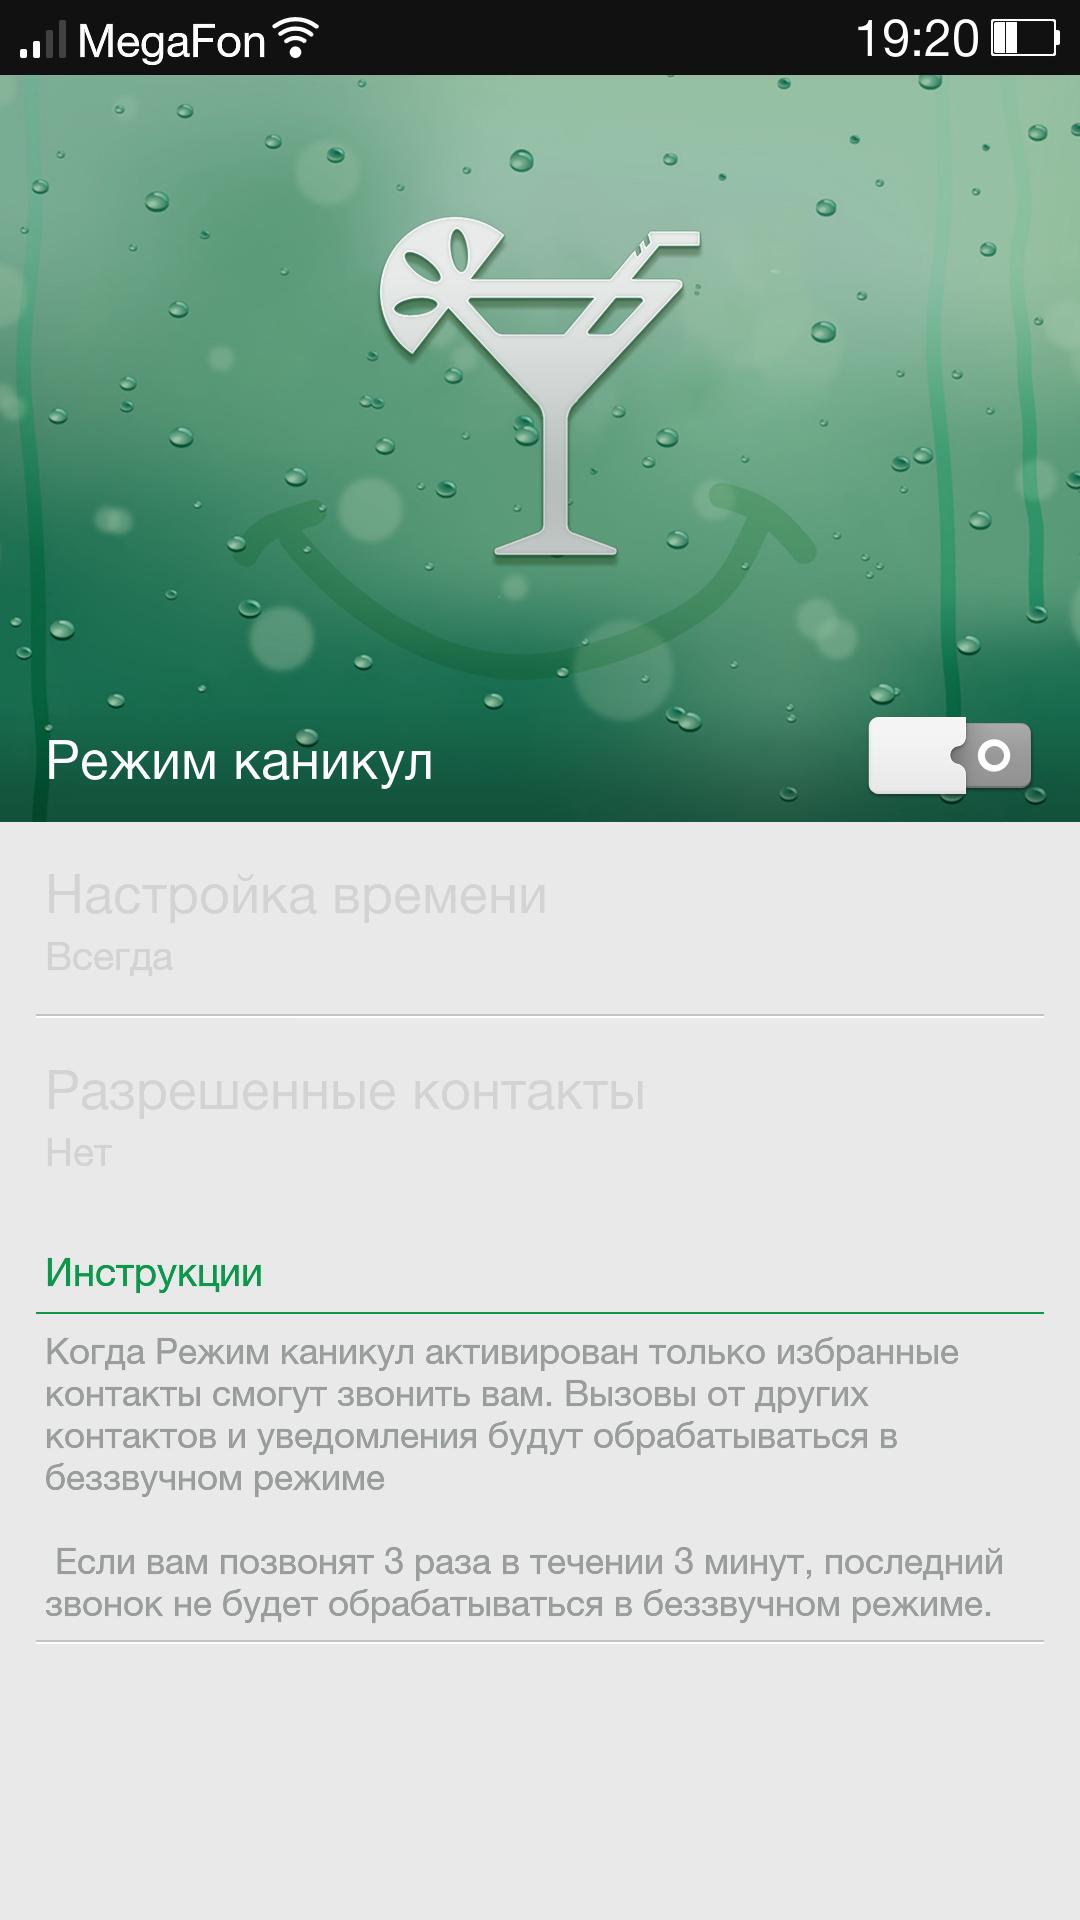 Screenshot_2013-10-26-19-20-53